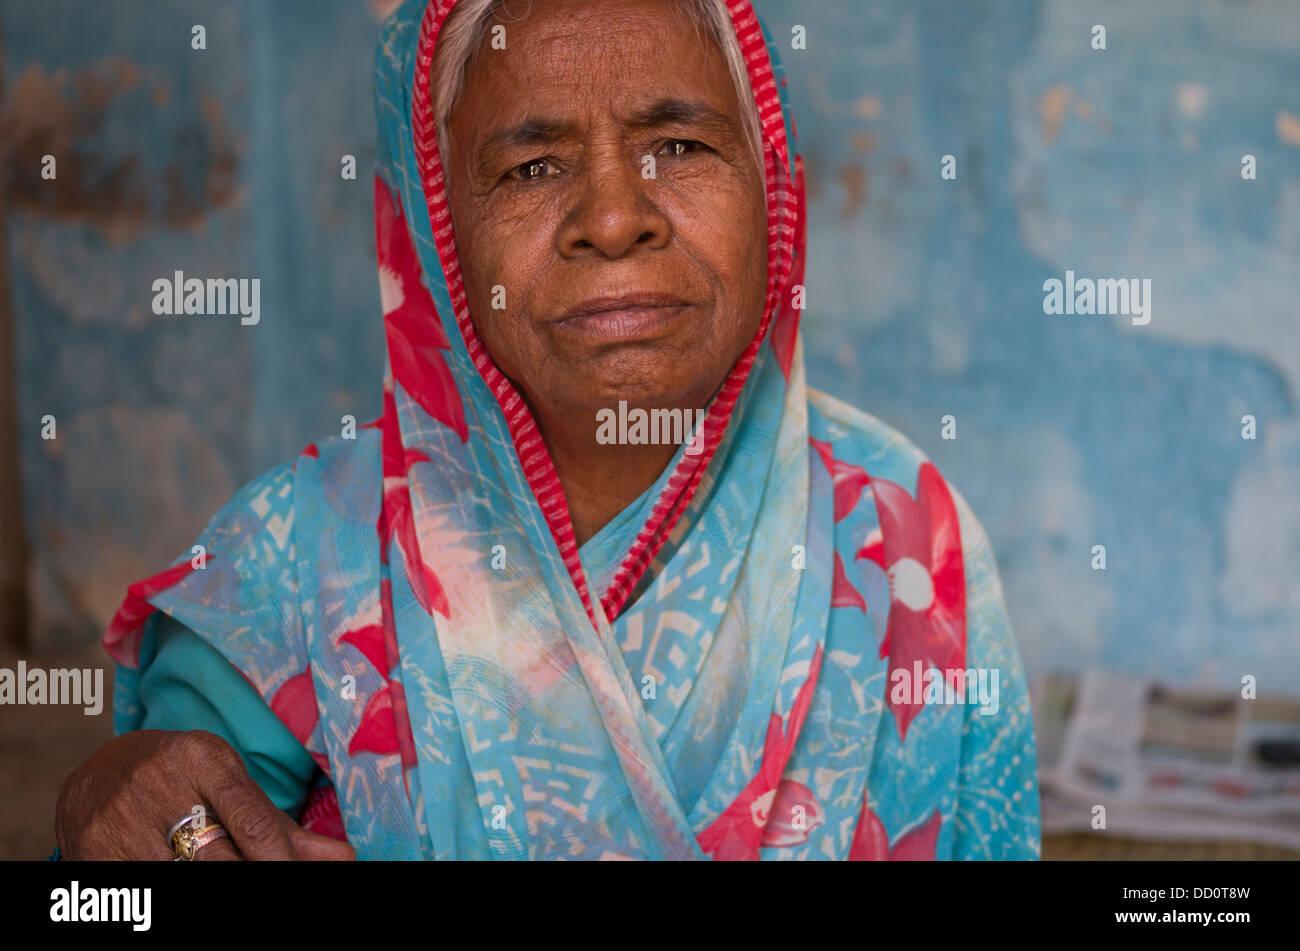 Indian lady in Sari at Maha Mandir Temple dedicated to Aayas Deonath. Now used as a school - Jodhpur, Rajashtan, - Stock Image